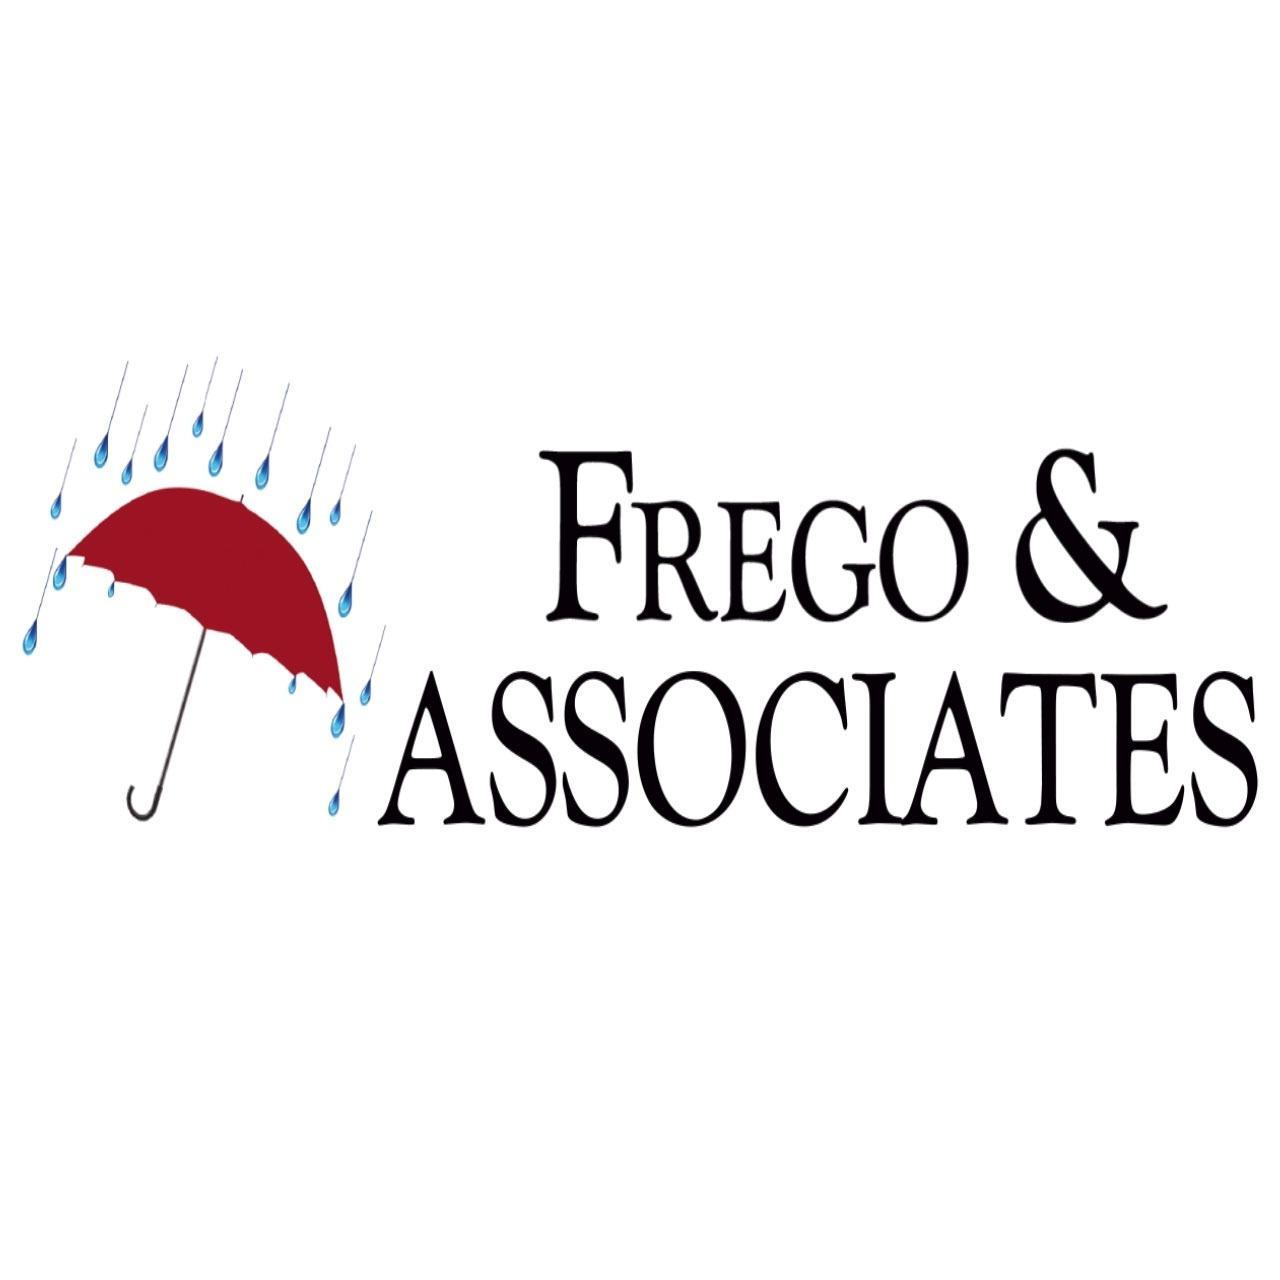 Frego & Associates image 1